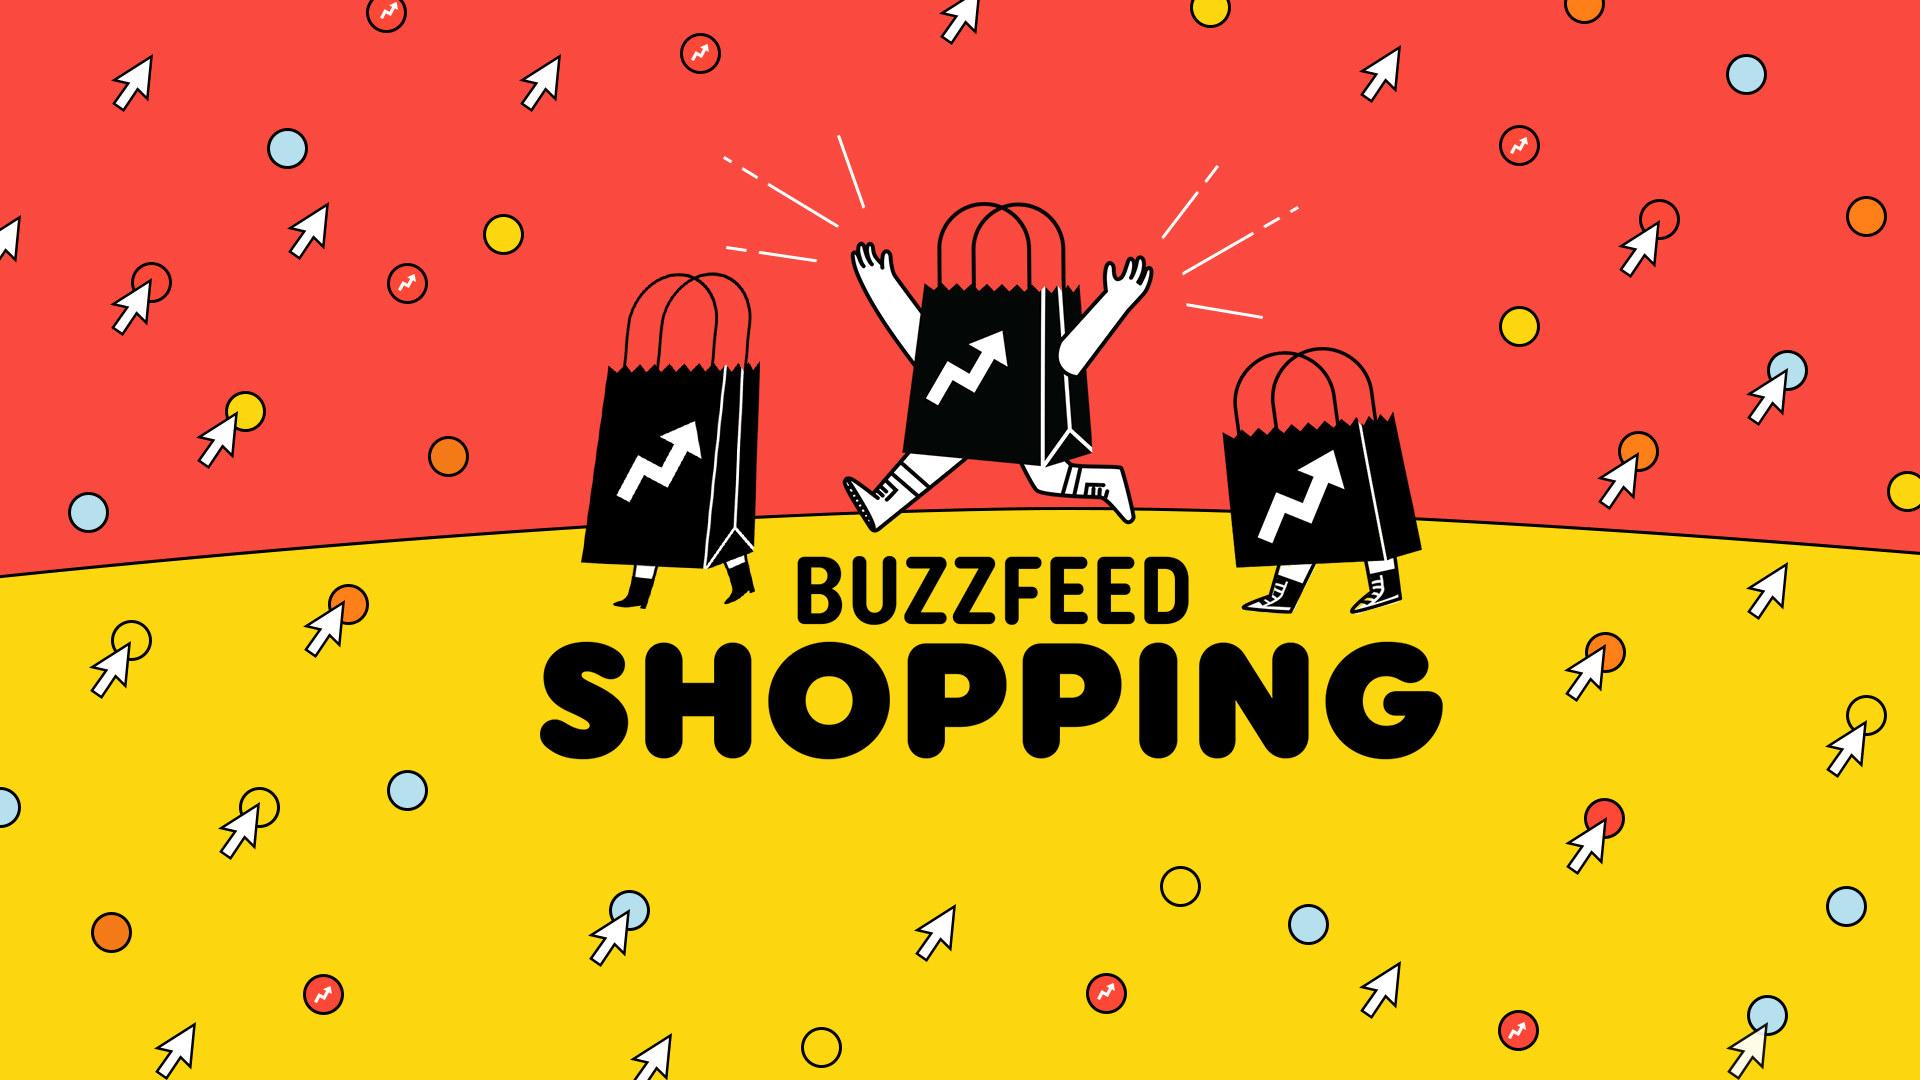 BuzzFeed Shopping logo